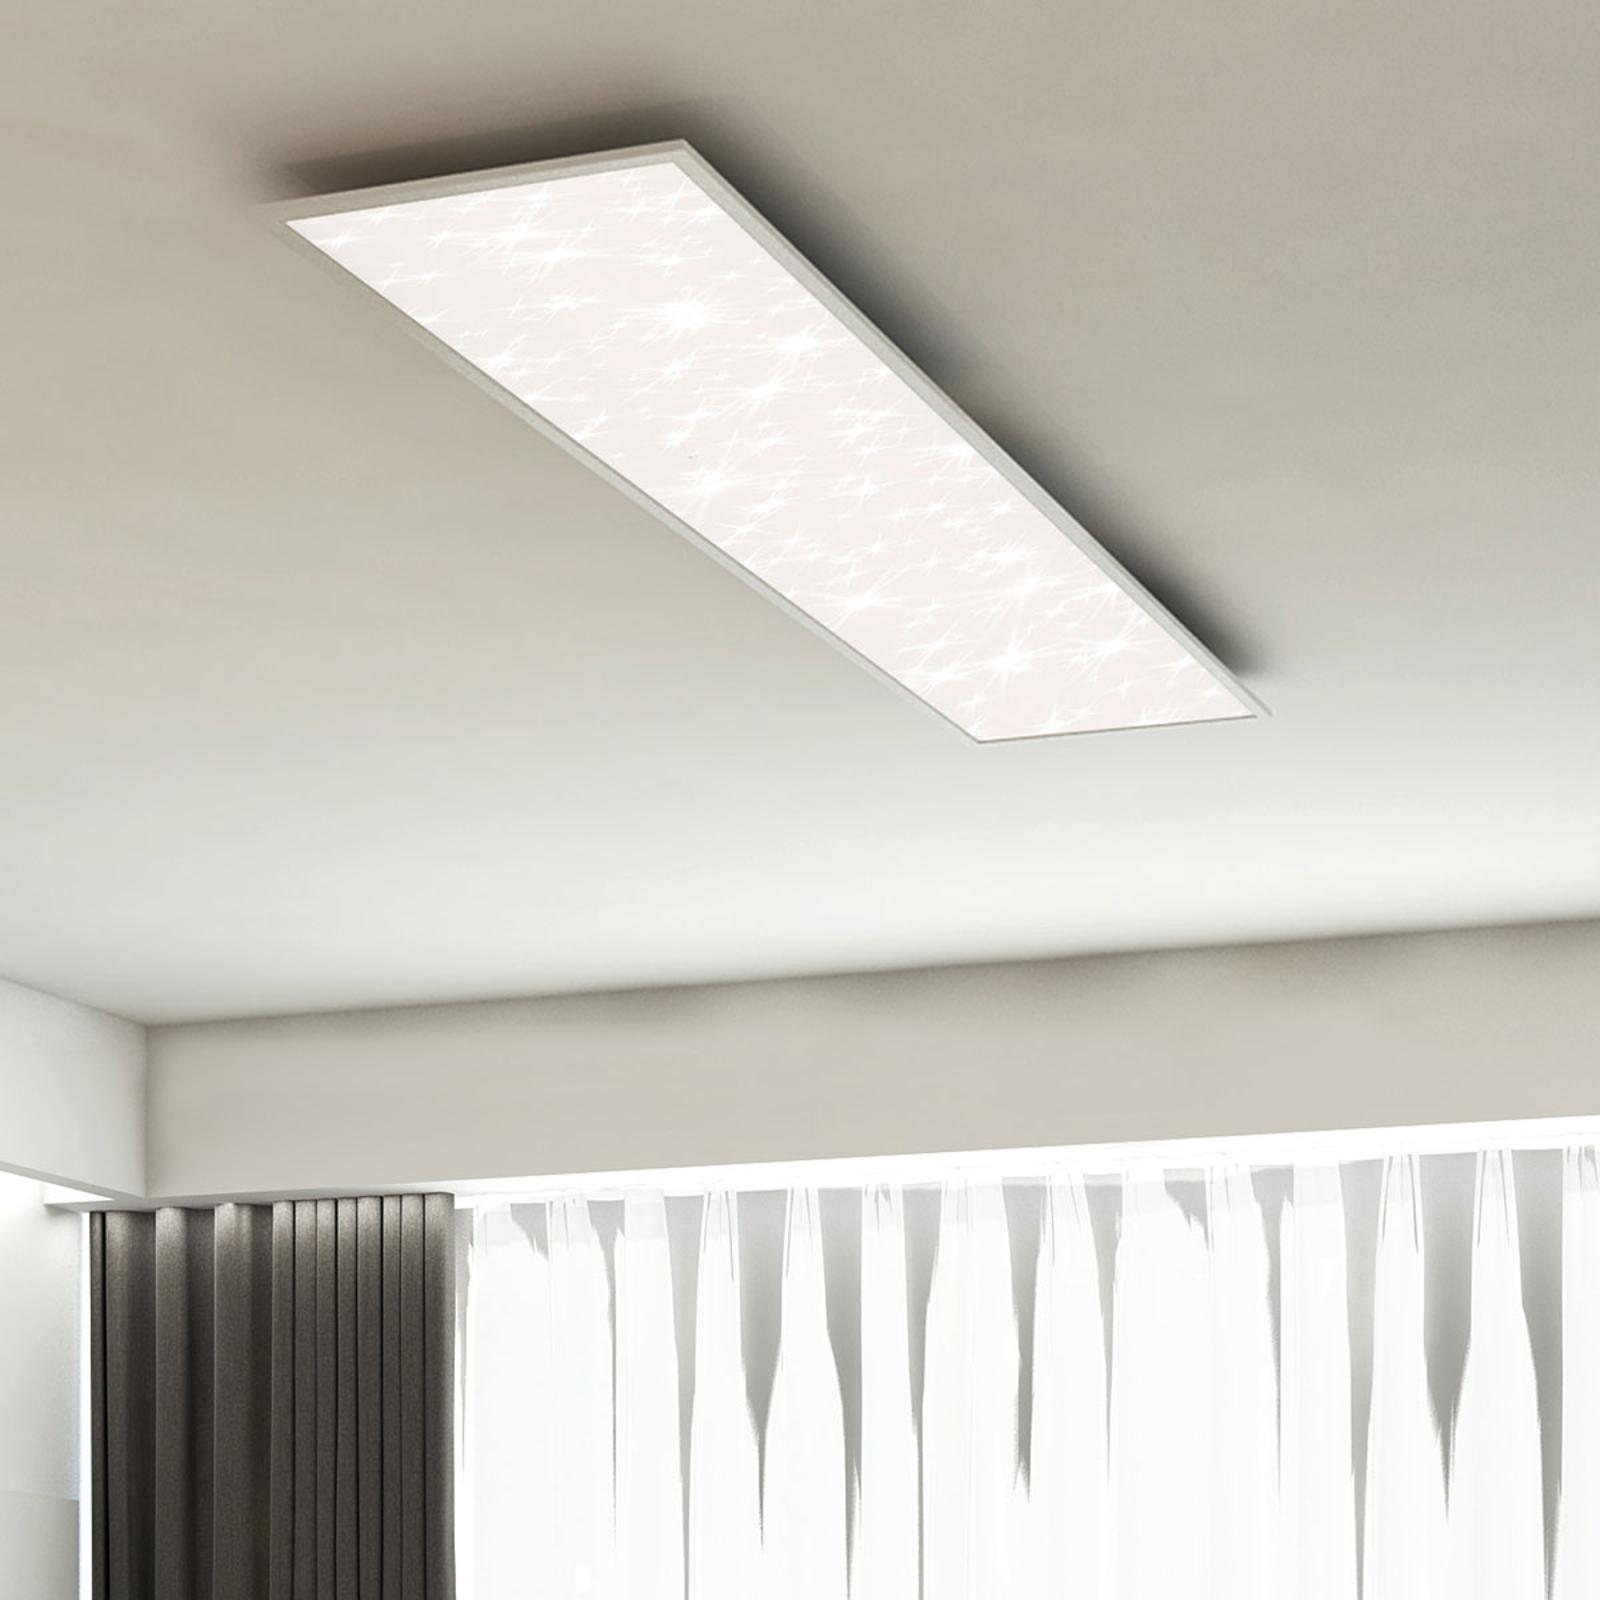 LED-Sternenhimmel-Panel Pallas CCT, 100 x 25 cm